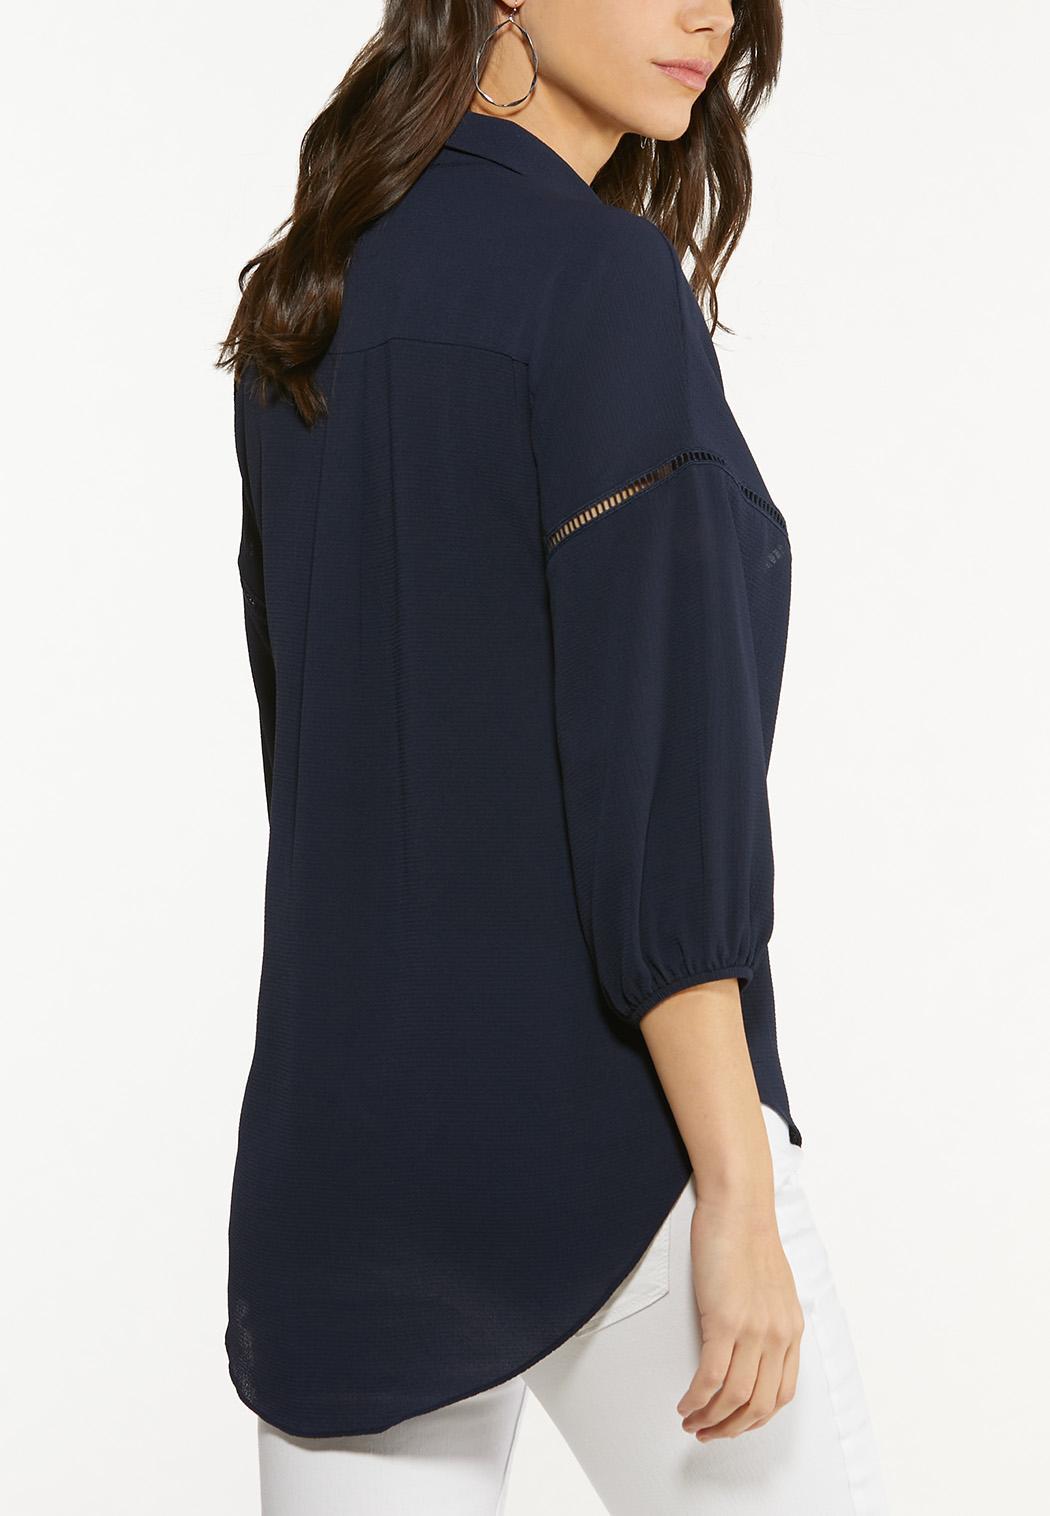 Plus Size Navy Lace Inset Top (Item #44613070)